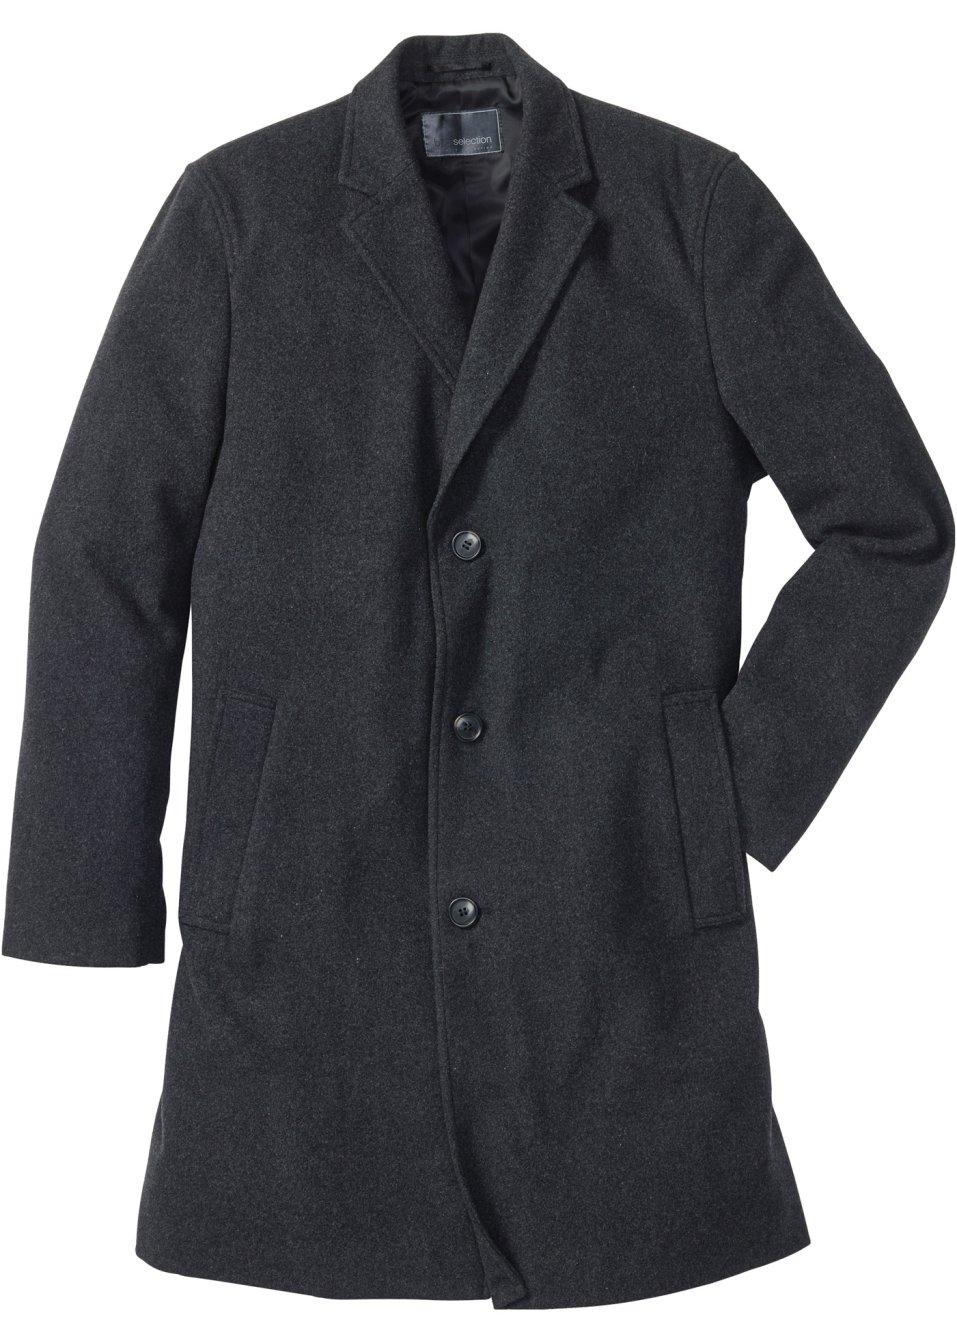 eleganter herren kurz mantel mit reverskragen anthrazit. Black Bedroom Furniture Sets. Home Design Ideas